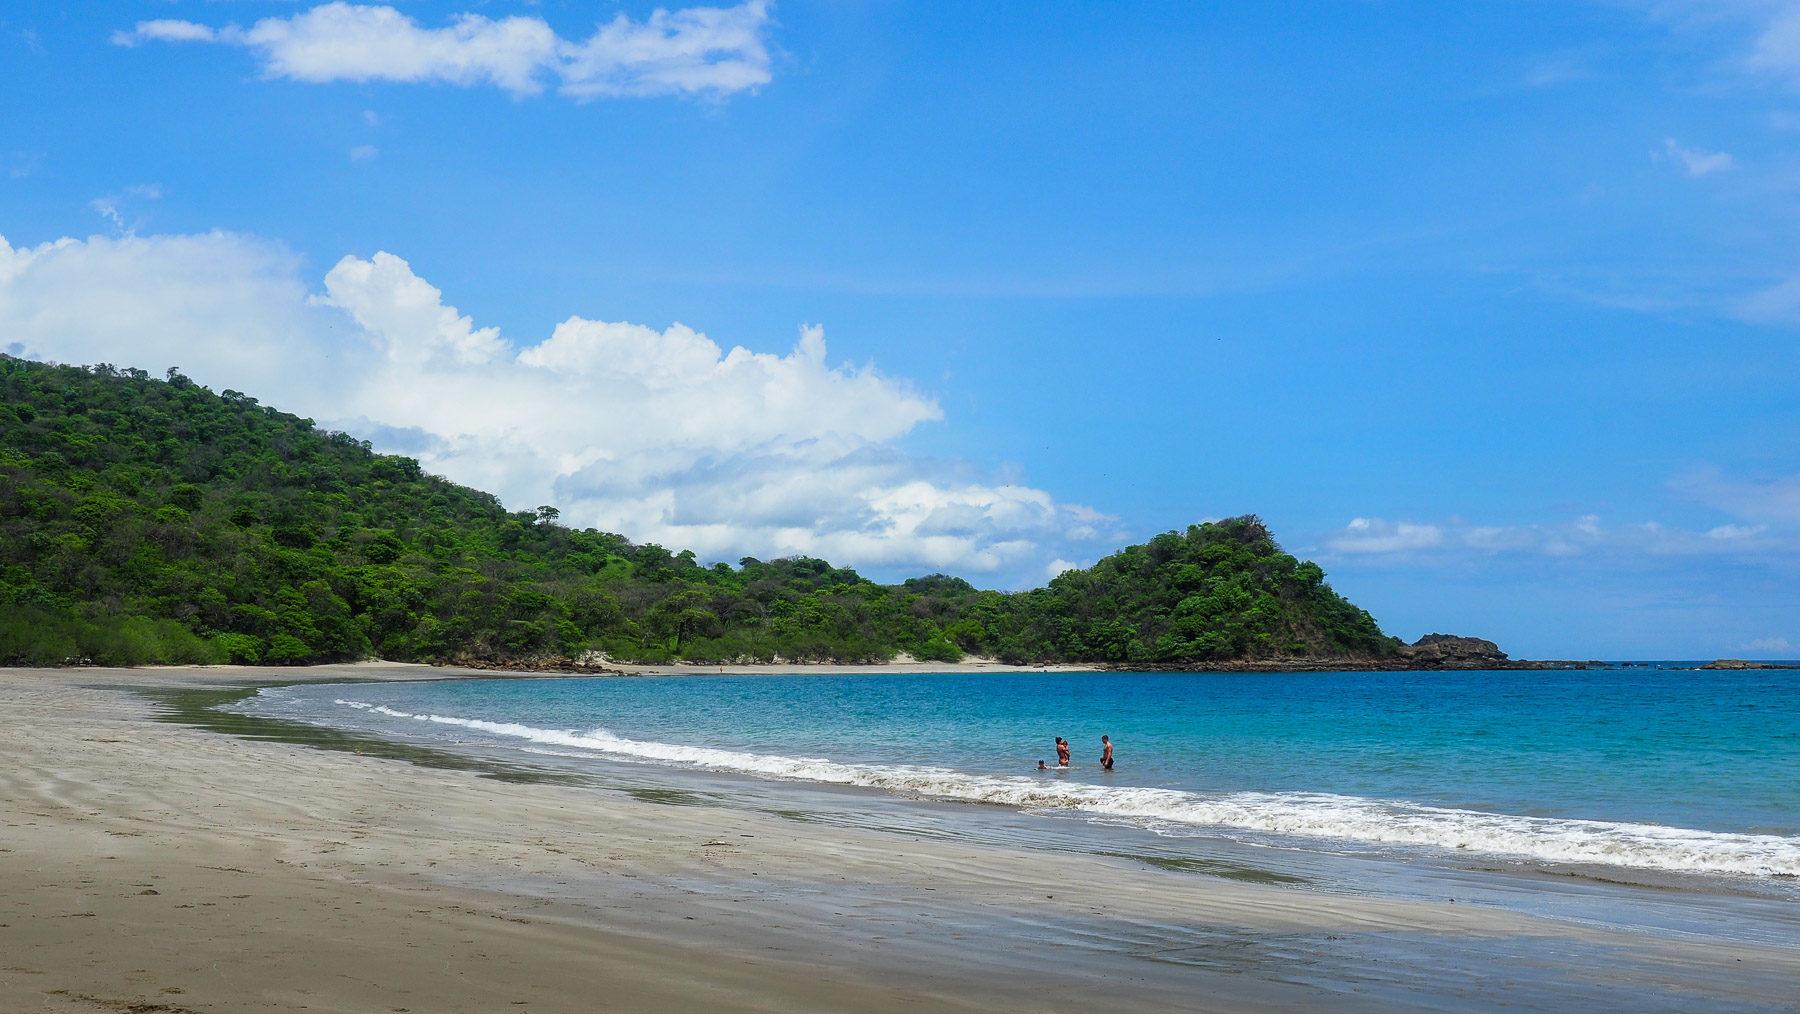 Wunderschöne Buchten am Pazifik im reizvollen Bahia de Salinas